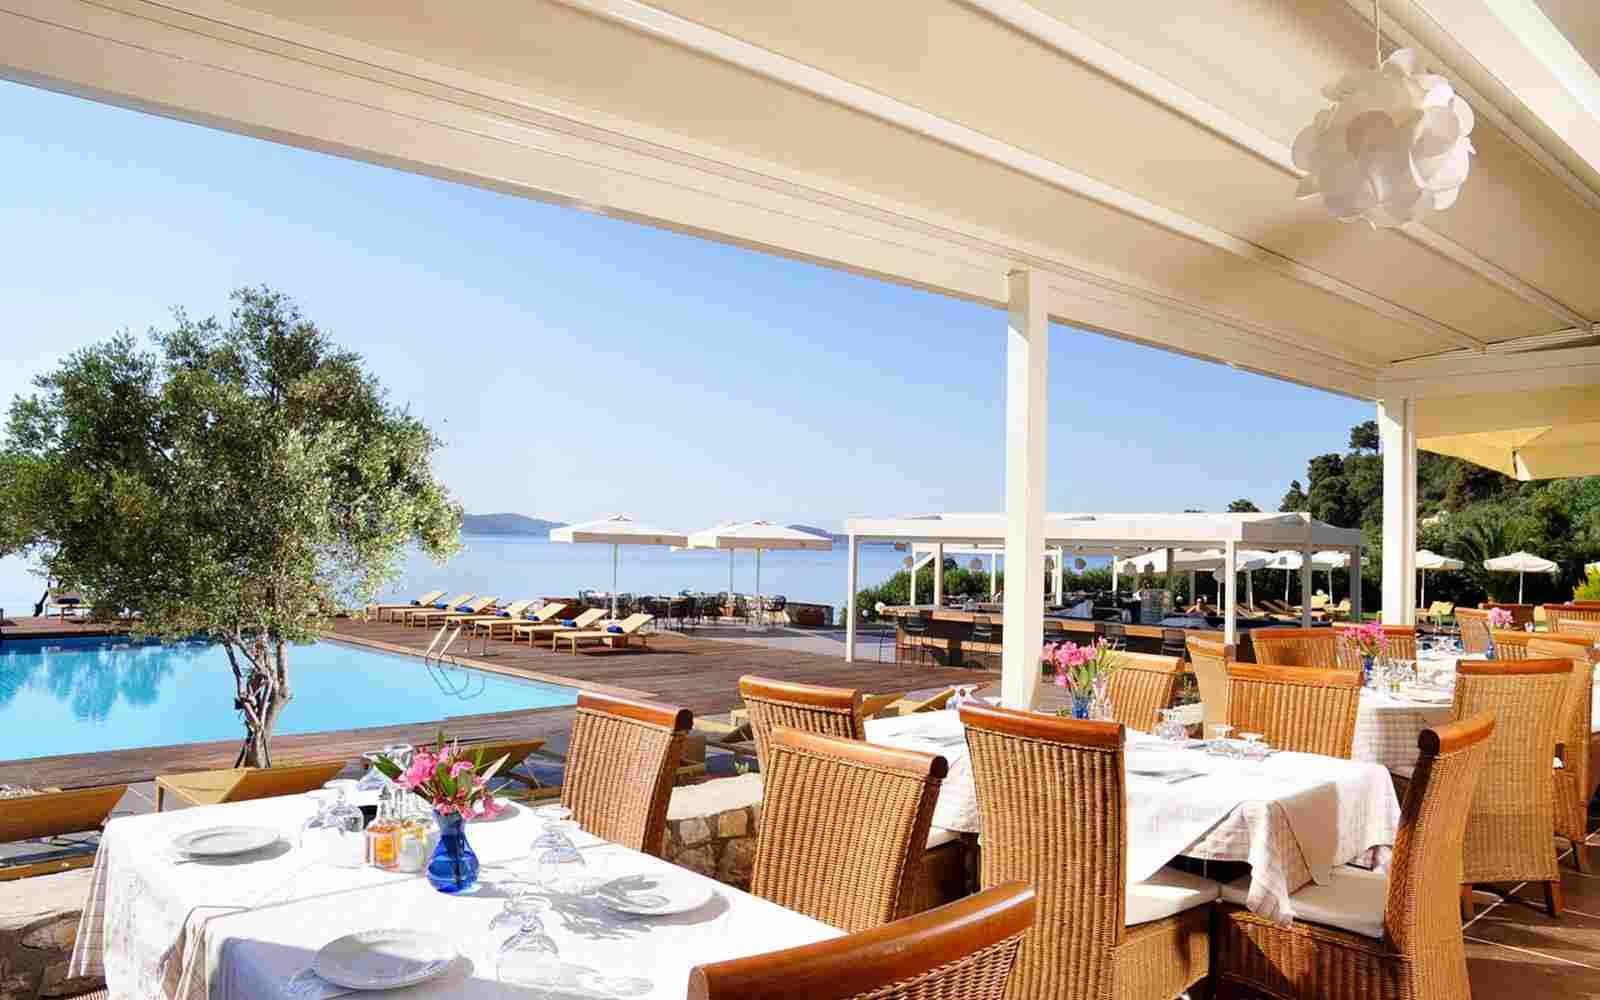 http://www.casacaribepuertomorelos.com/wp-content/uploads/2016/03/summer-hotel-08.jpg